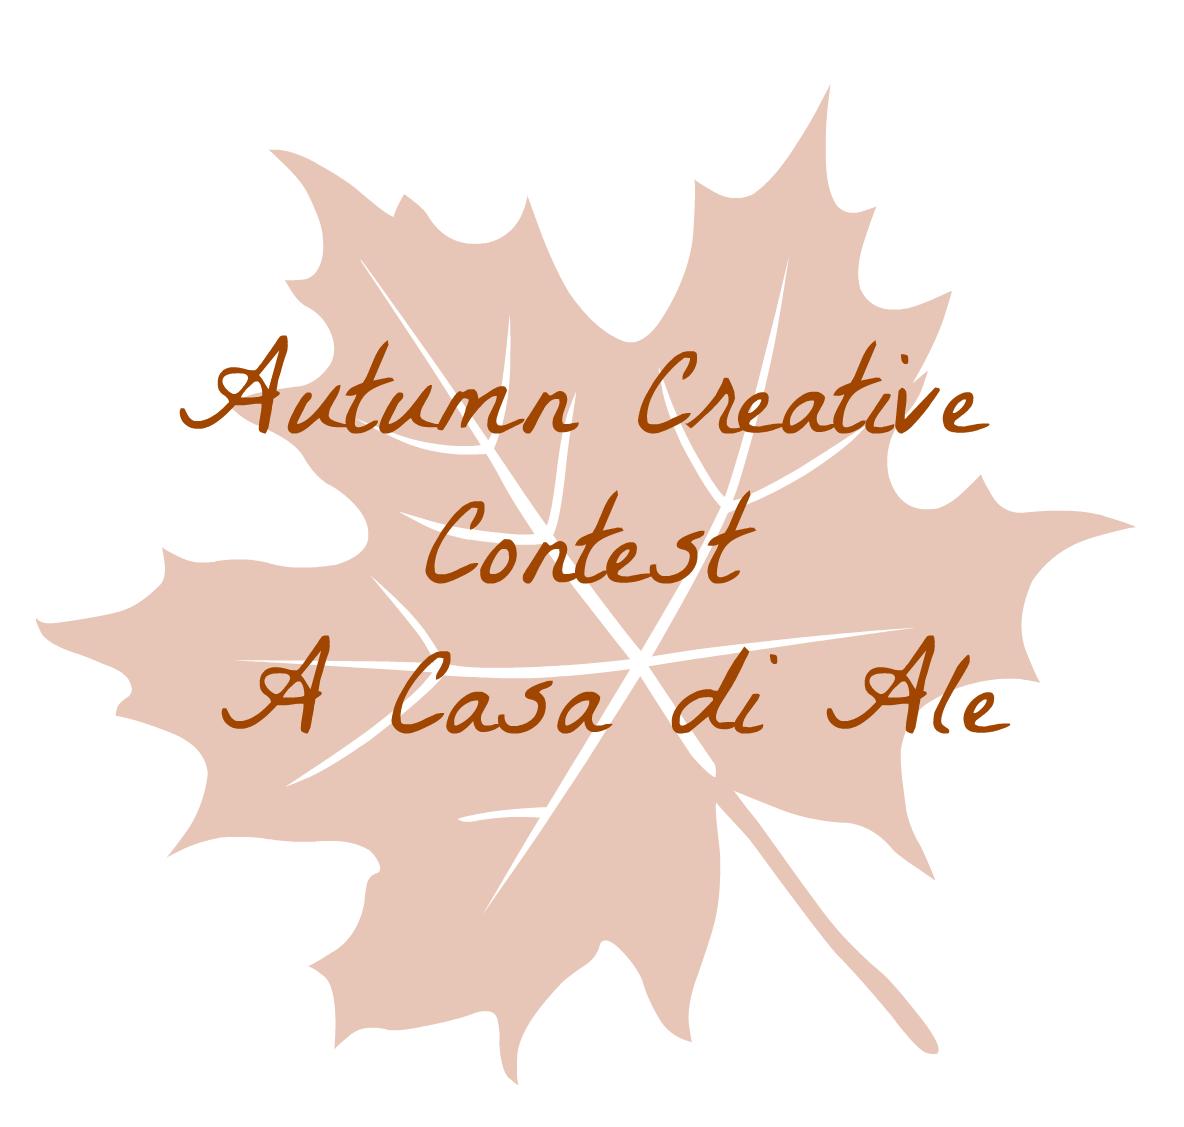 Autumn Creative Contest